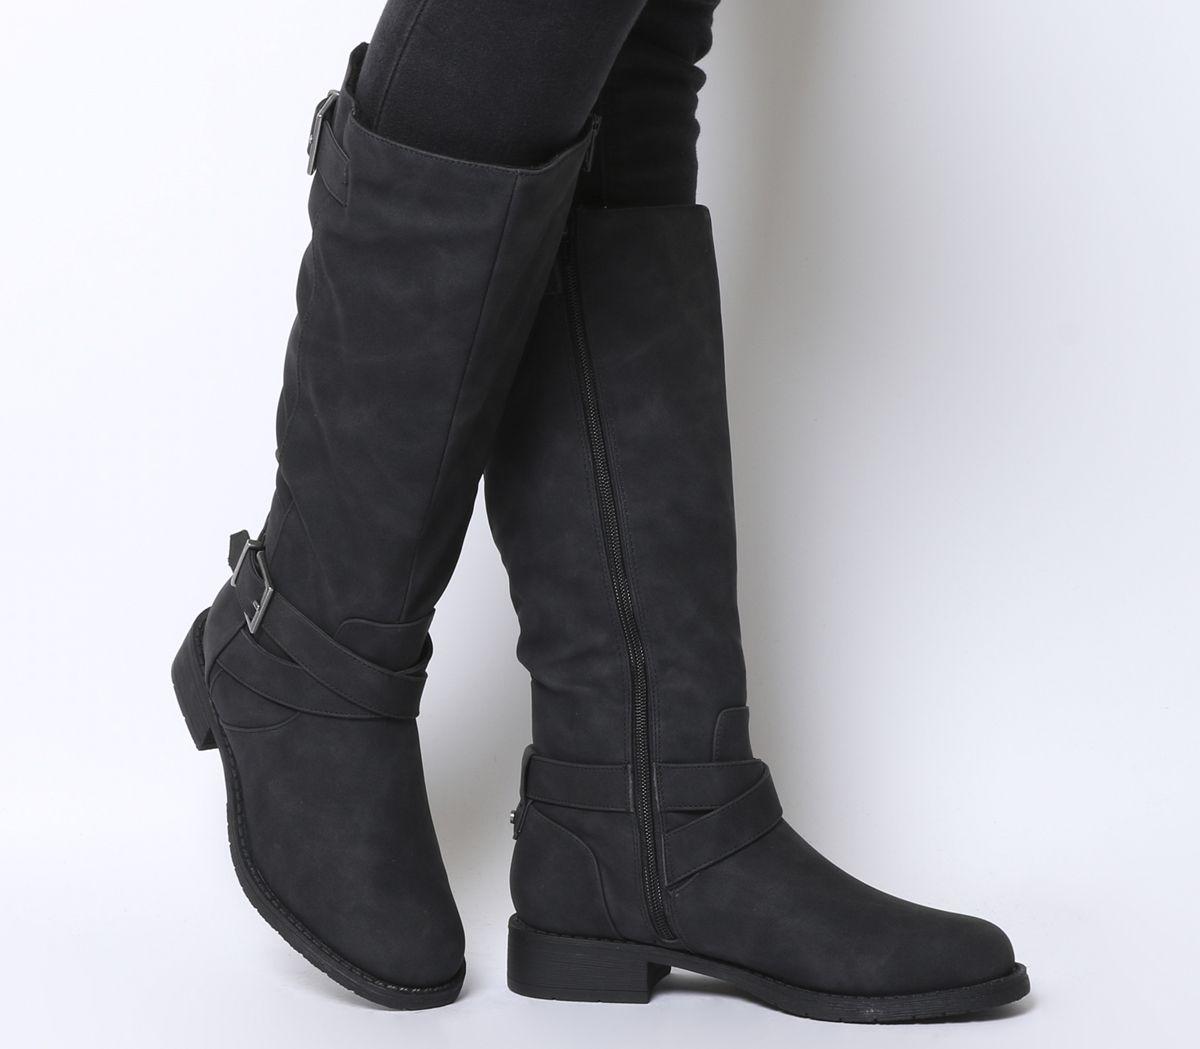 e738e72f7b4 Office Kamel Biker Knee Boots Black Fur Lined - Womens Boots